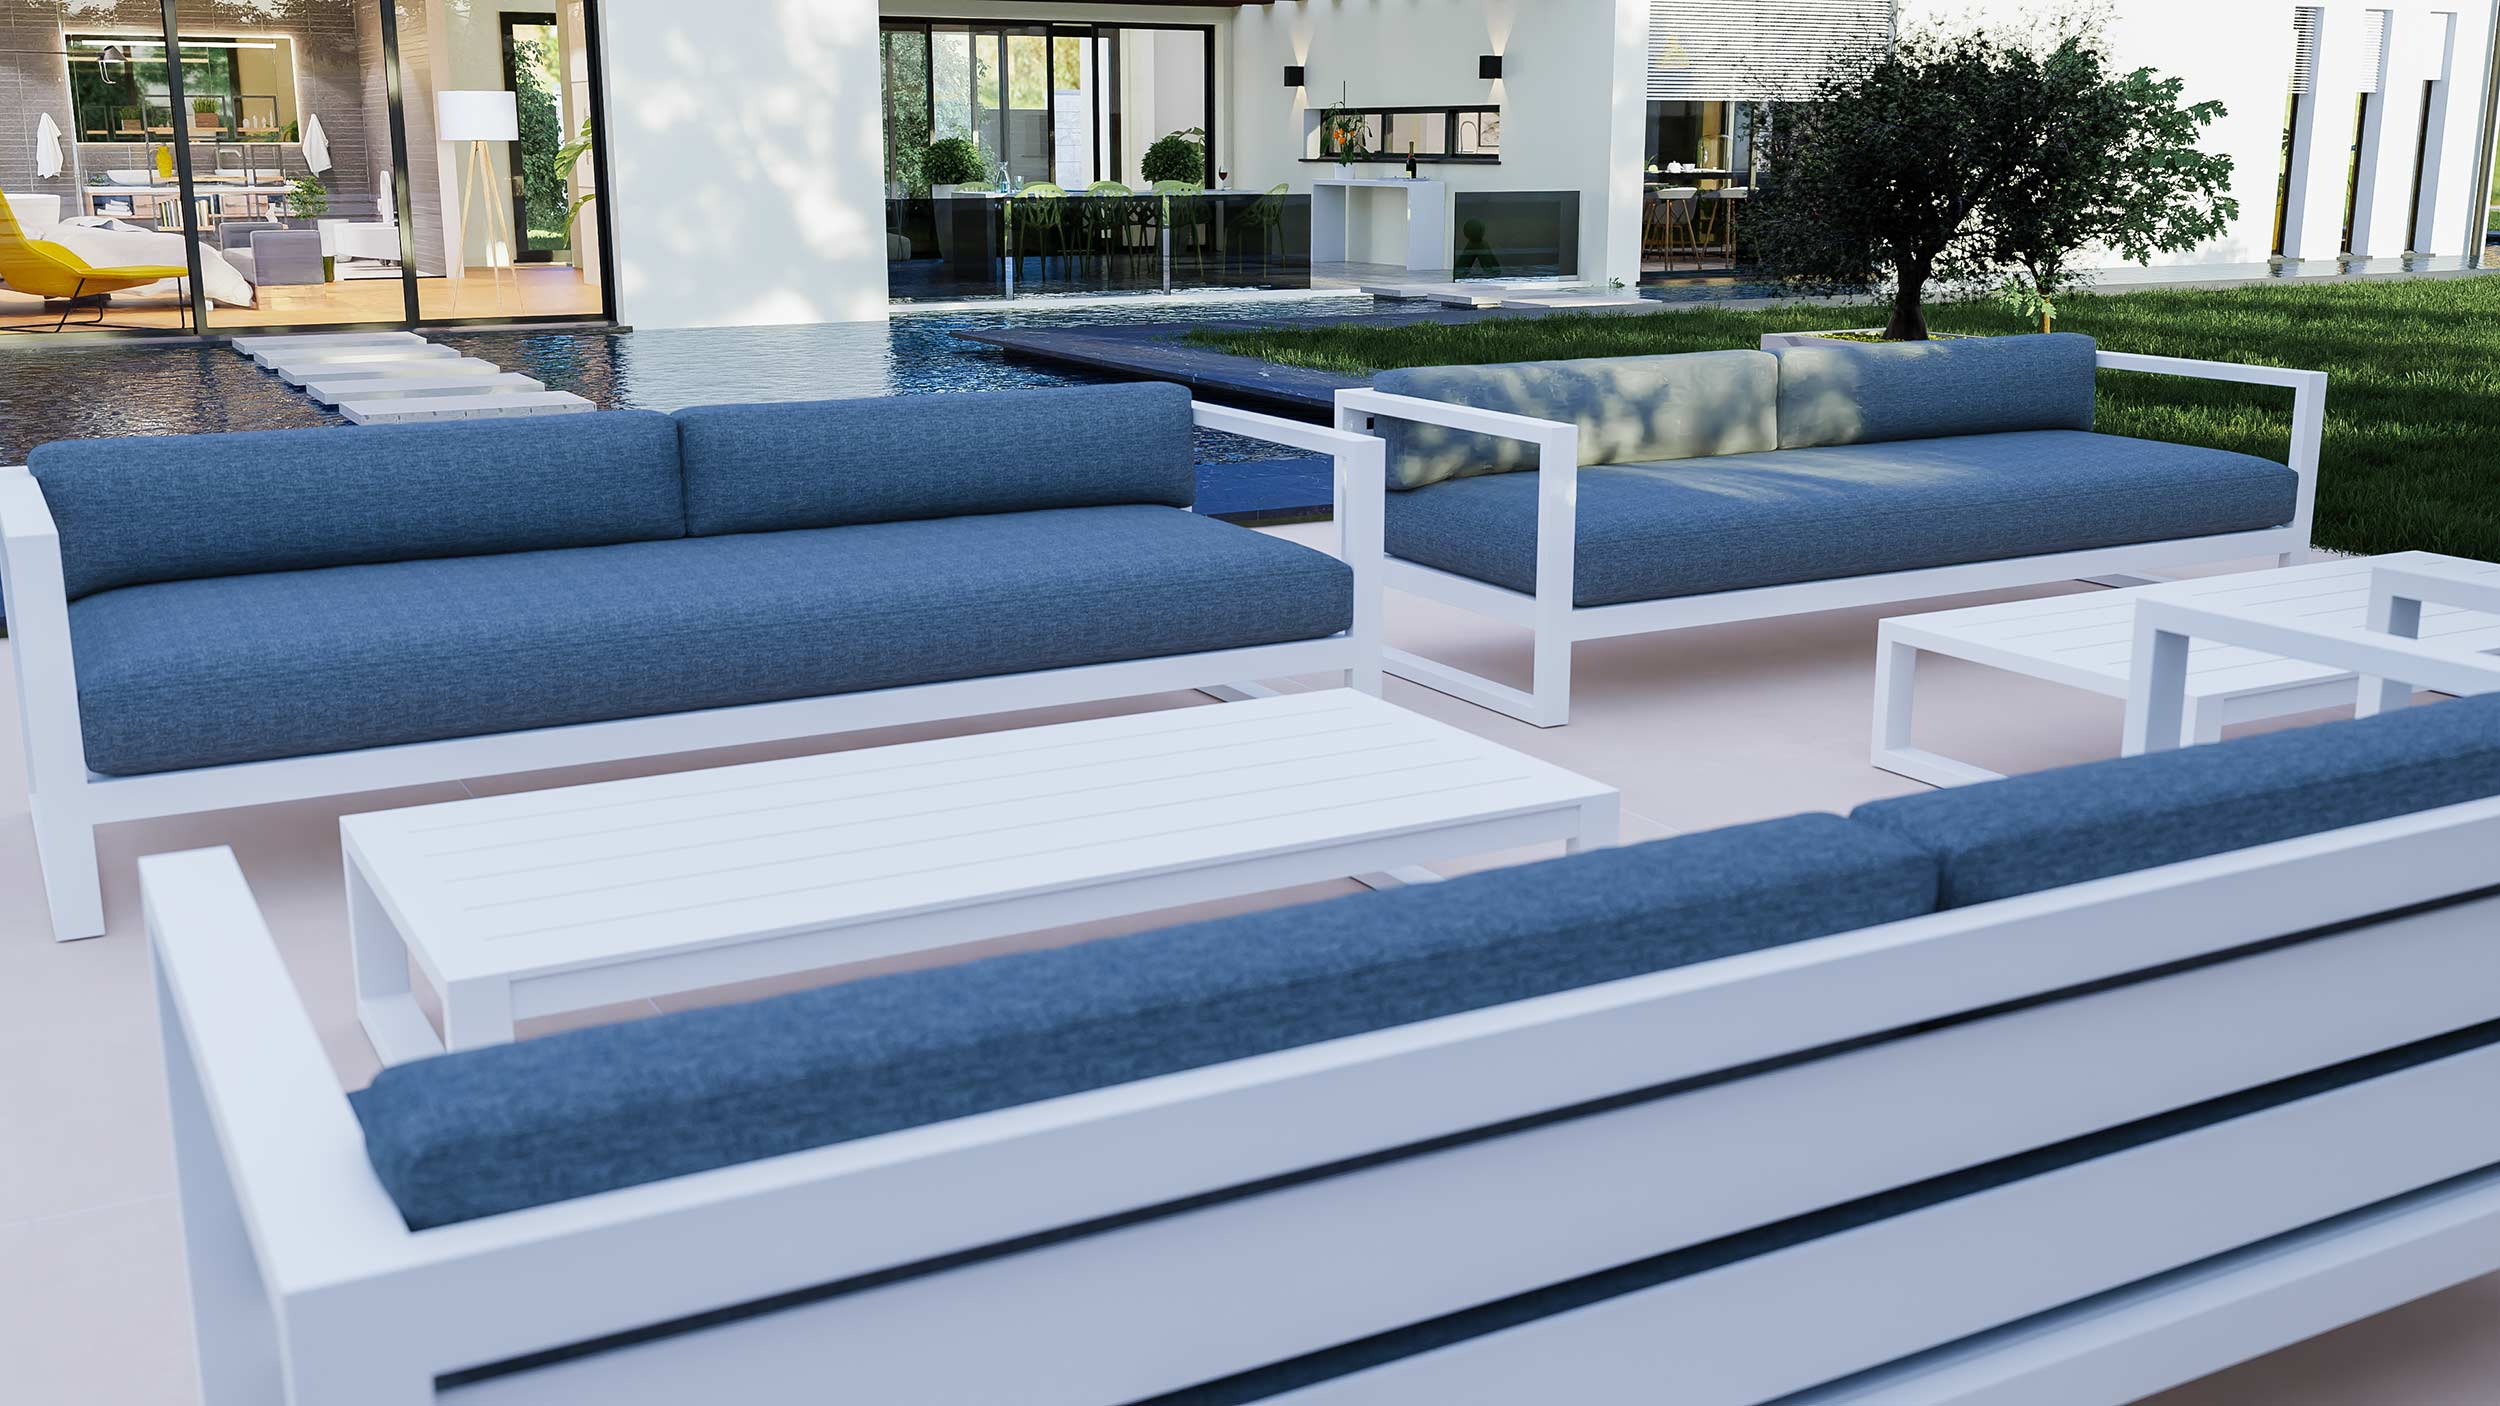 Terras-richting-patio